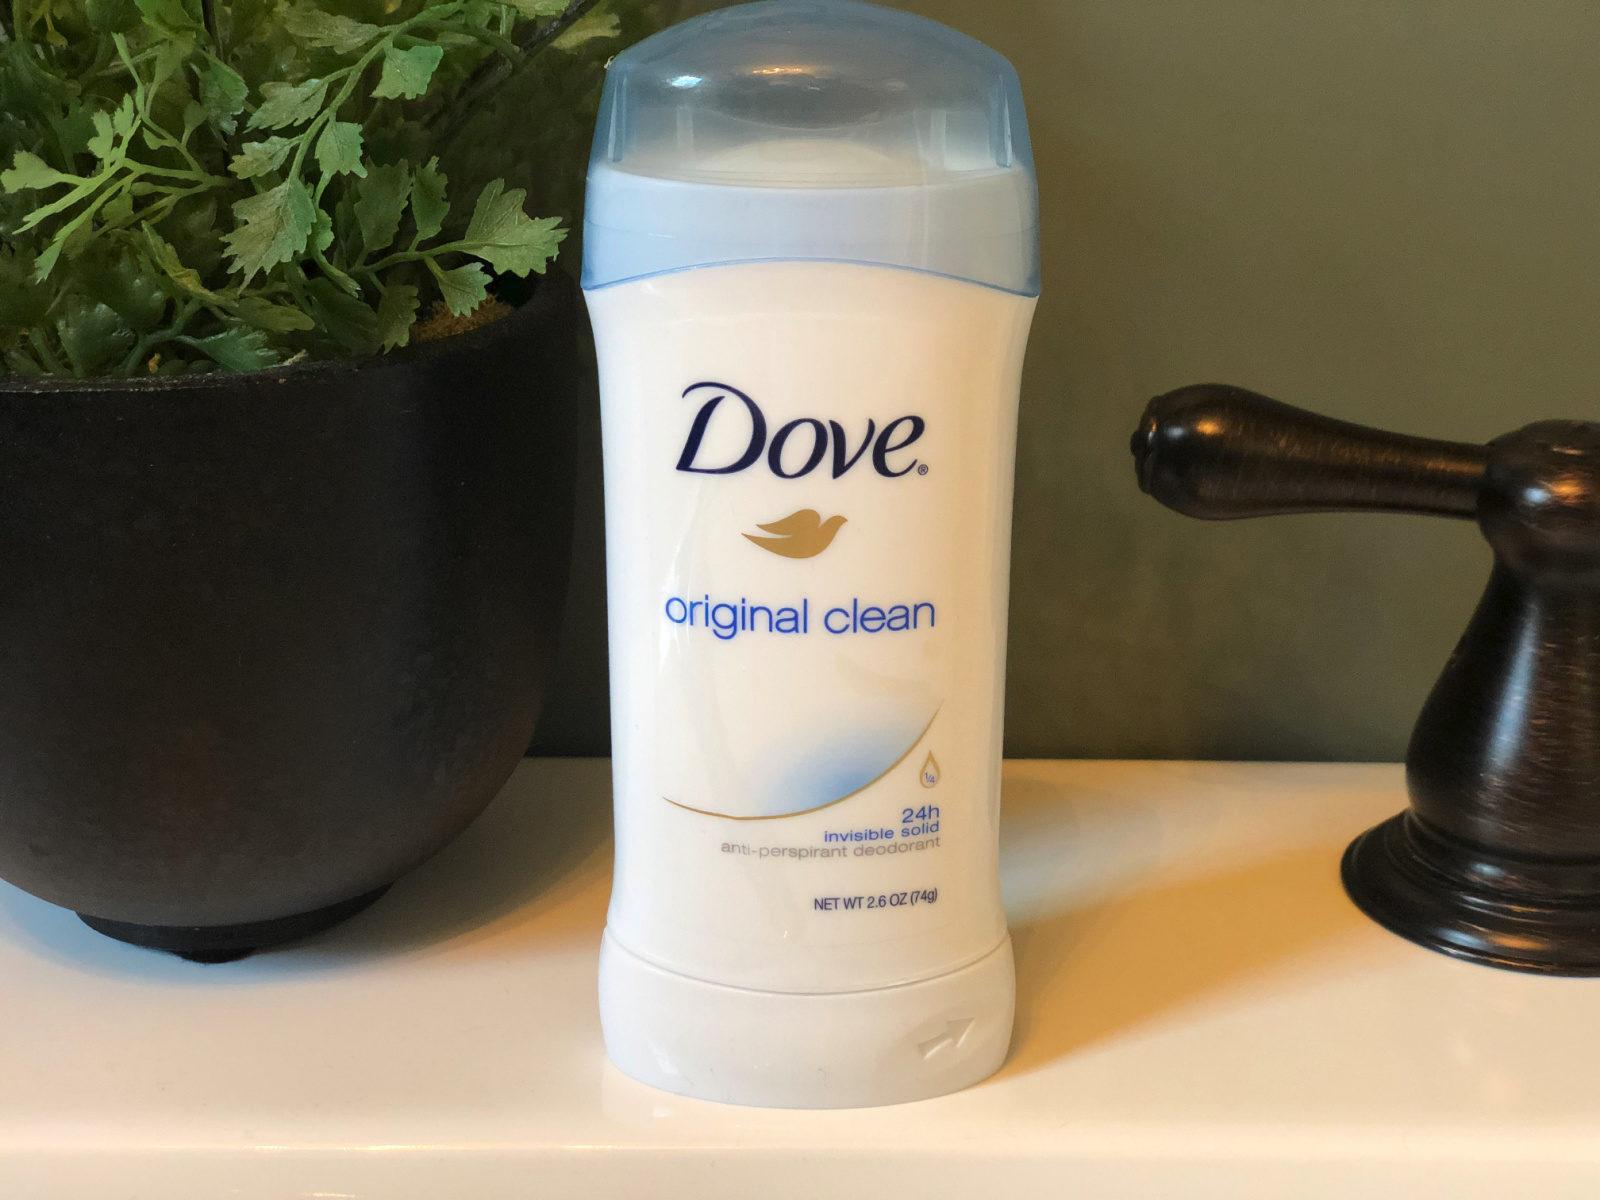 Dove Invisible Solid Anti-Perspirant Deodorant Just 54¢ At Publix on I Heart Publix